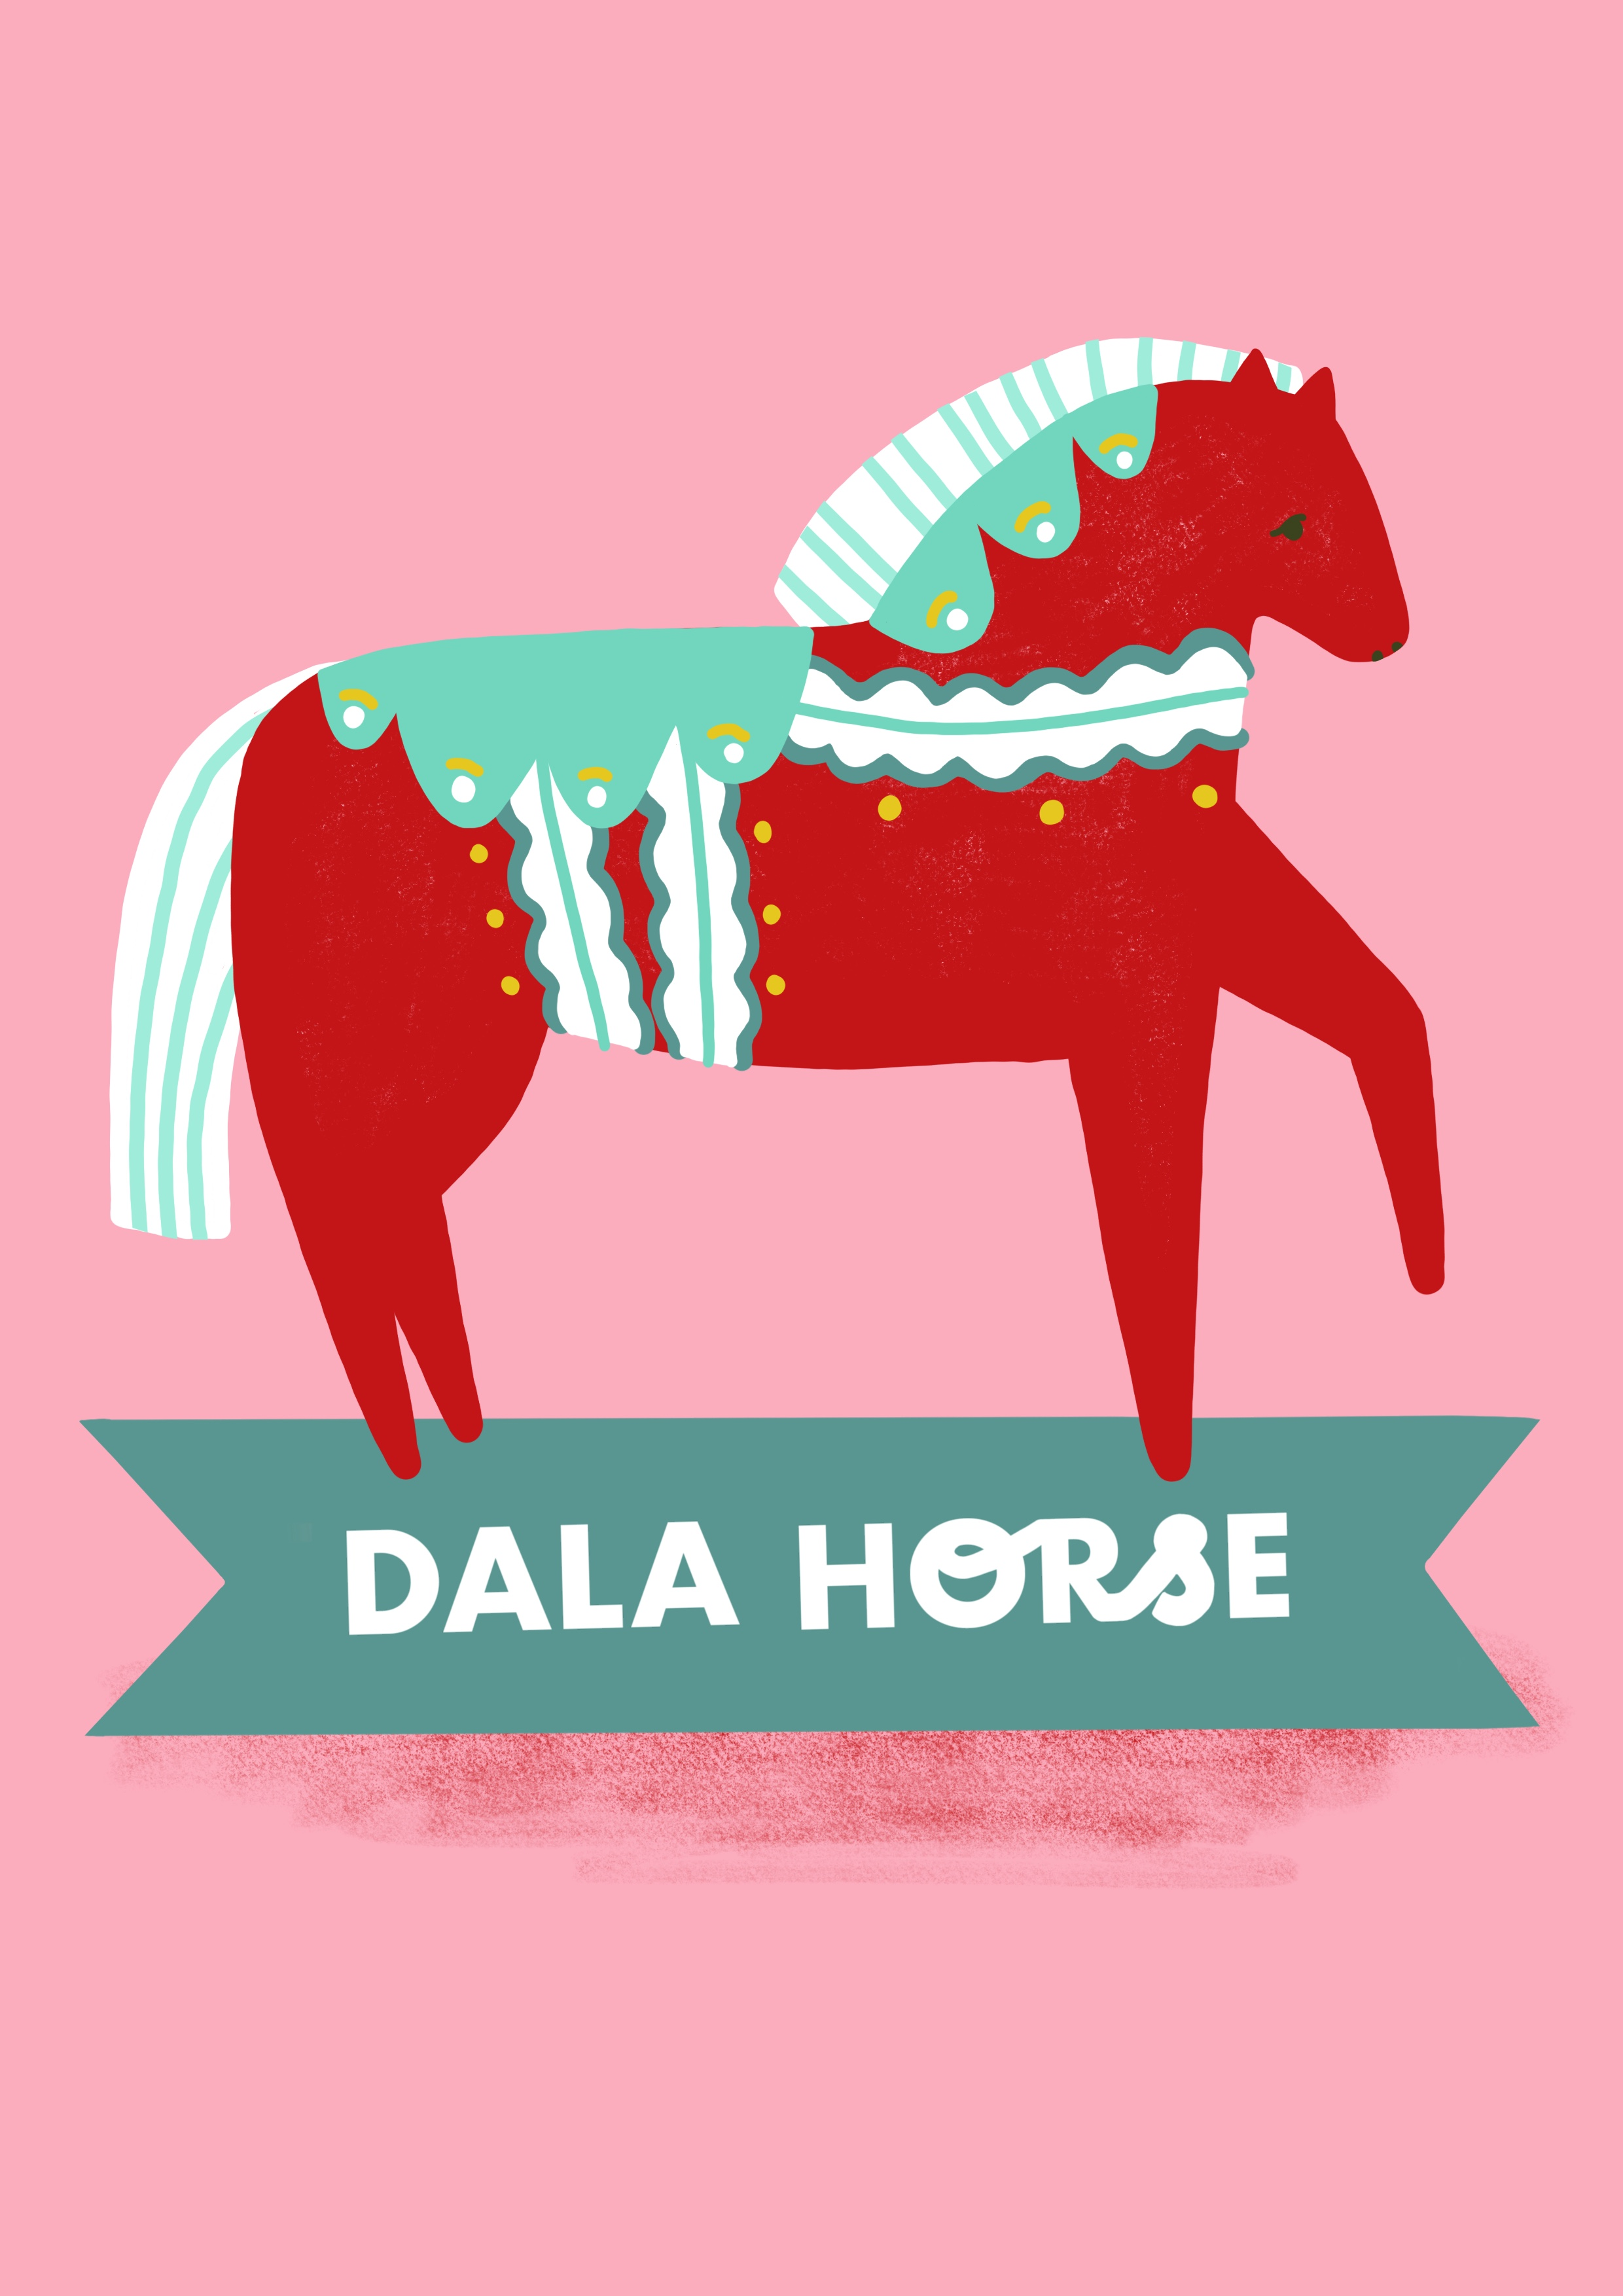 Dala Horse A4 Print